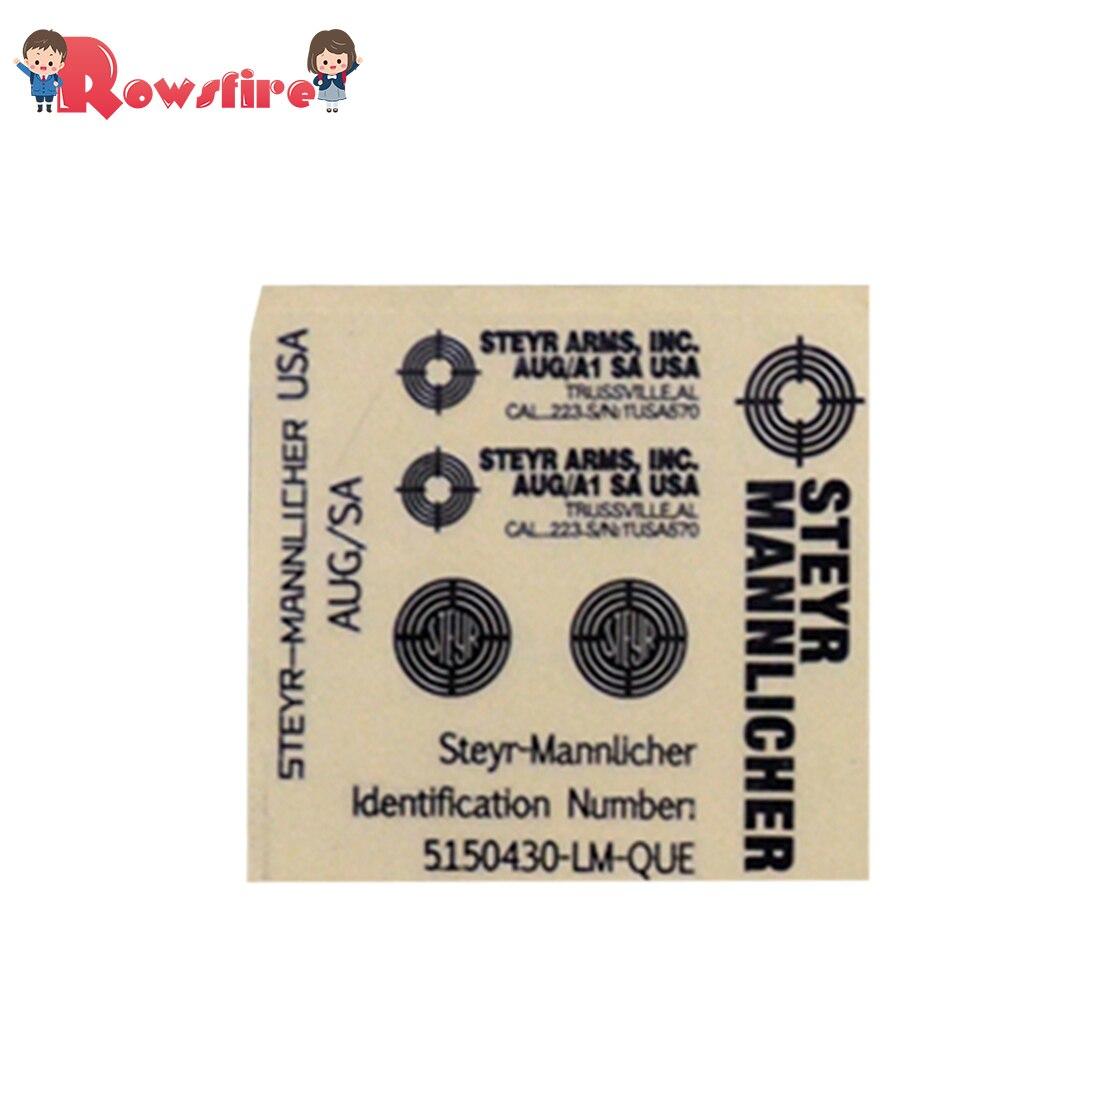 AUG Series Metal Stickers Decorative Decals - Silver/Grey White/Black